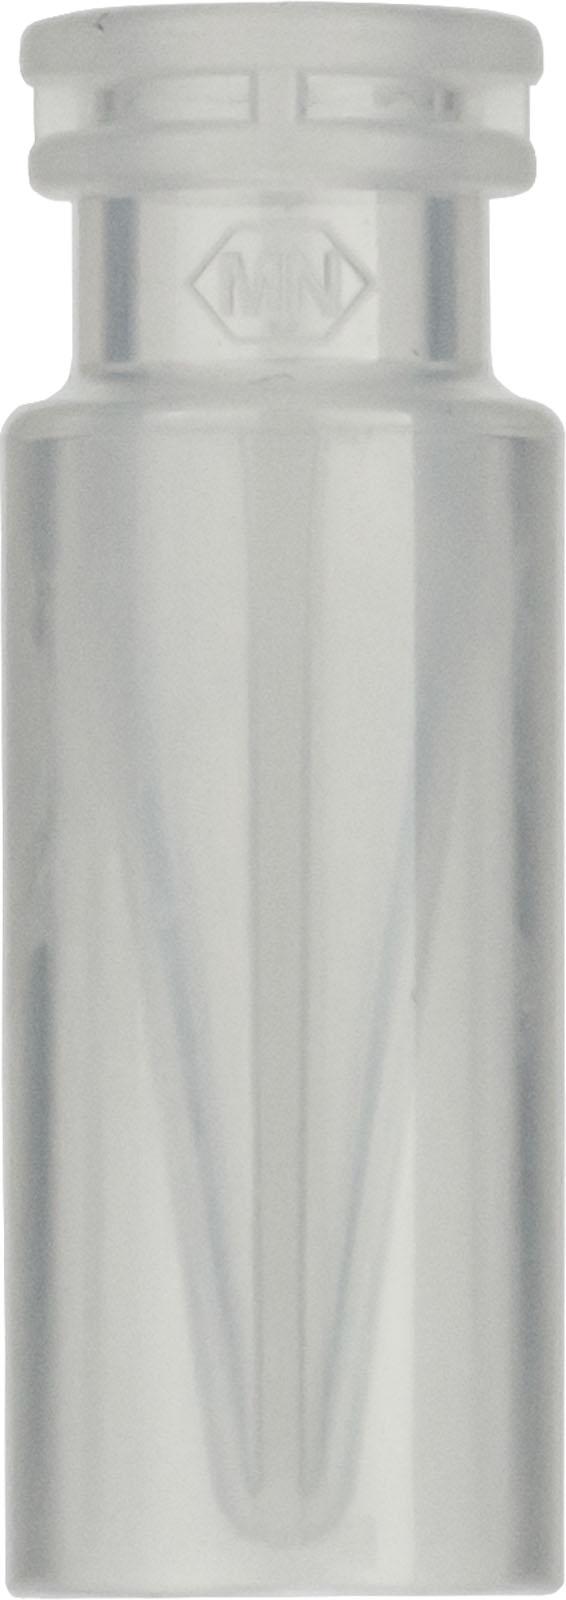 PP Vial N11-0.3, SR, tr, 11,6x32, Konus